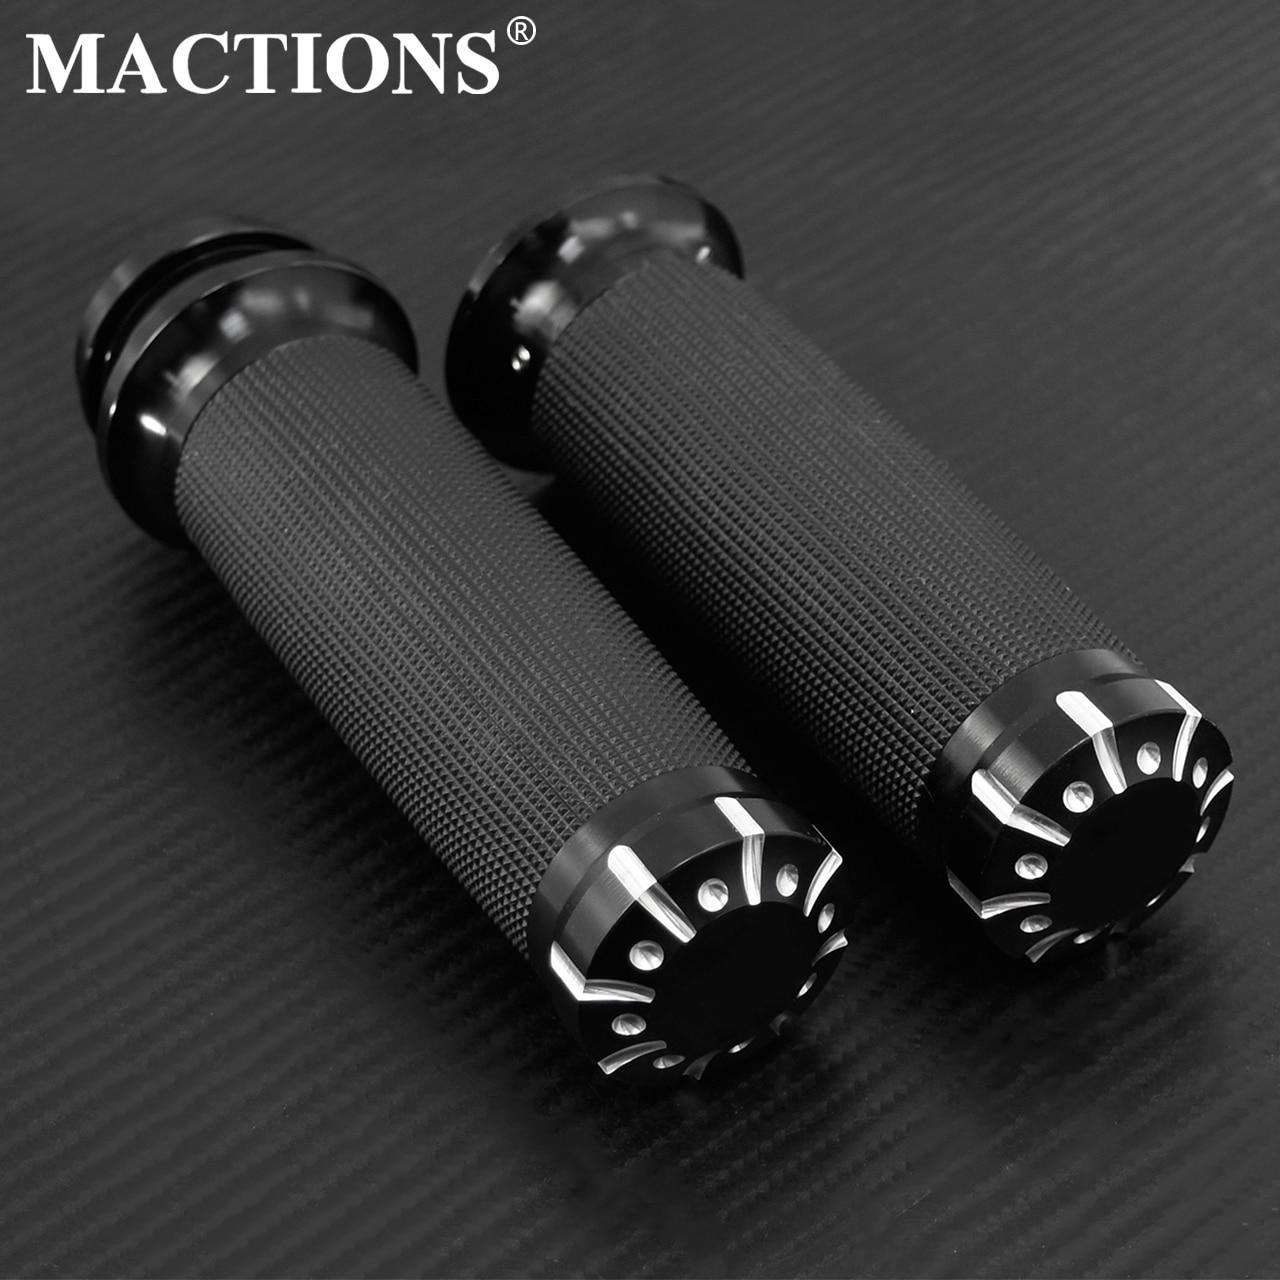 Mactions Grips Black 1